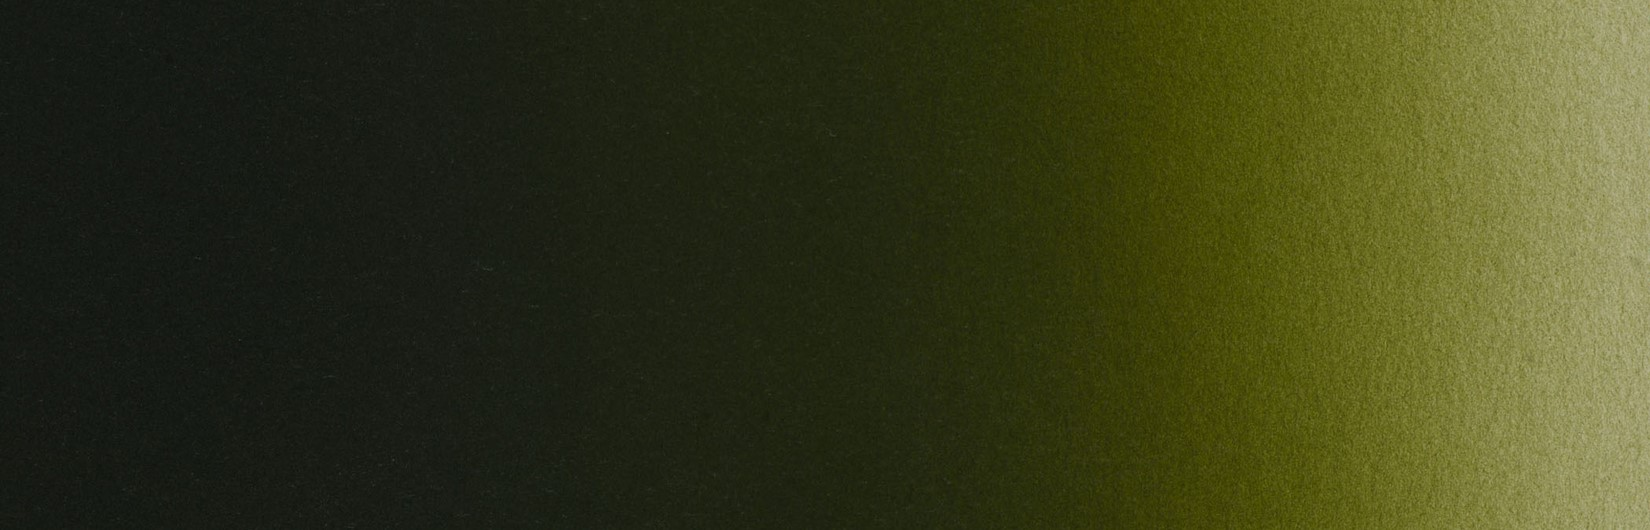 5049-createx-illustration-bloodline-vile-green.jpg